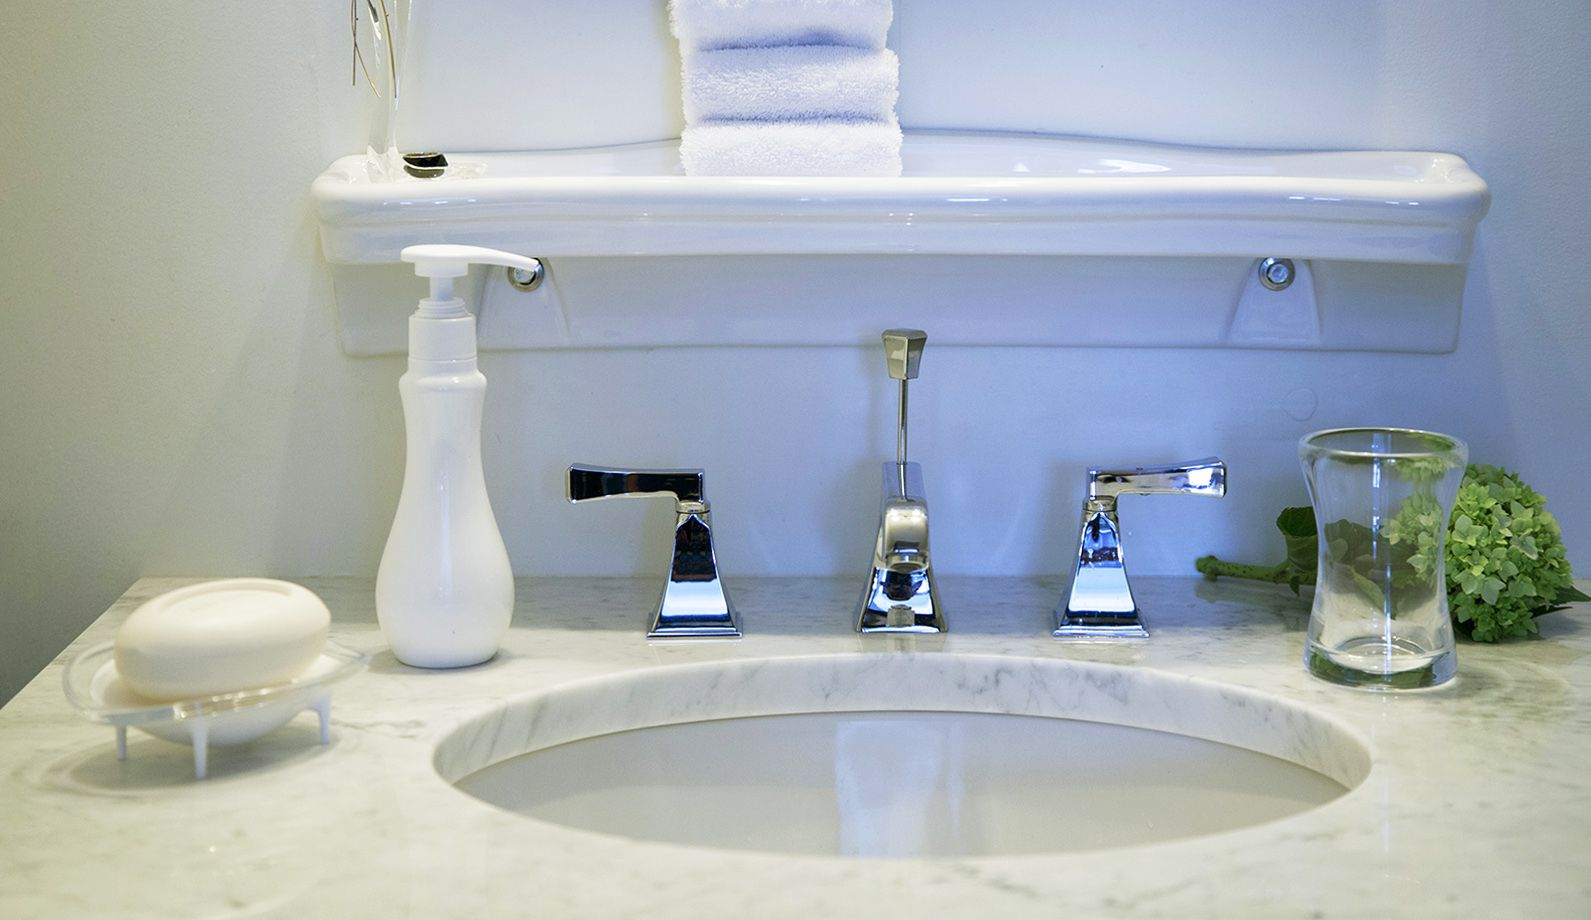 Nice Daisy Bathroom Accessories Motif - Bathroom - knawi.com